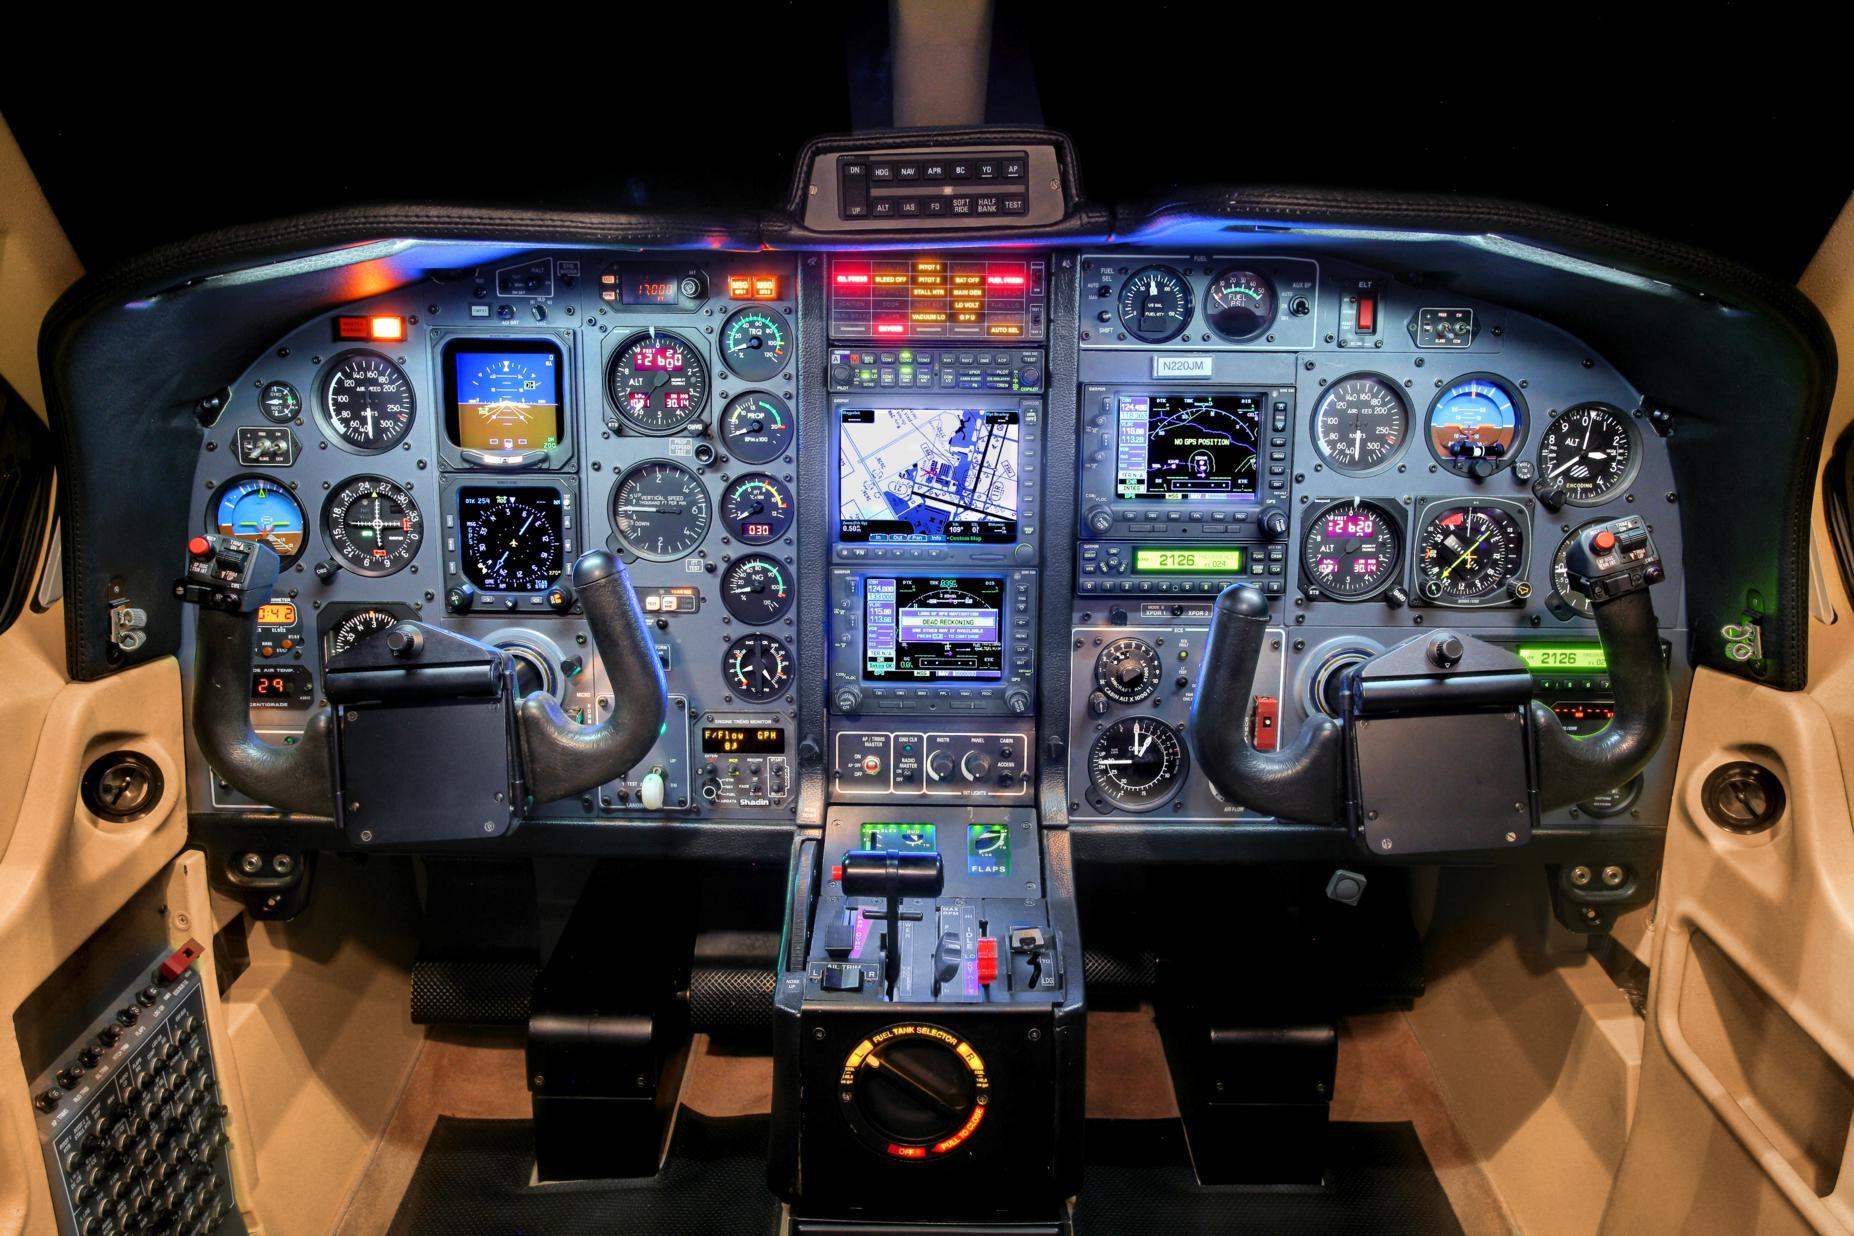 Premier Jet Aviation Jetav 2004 Socata Tbm 700c2 S N 289